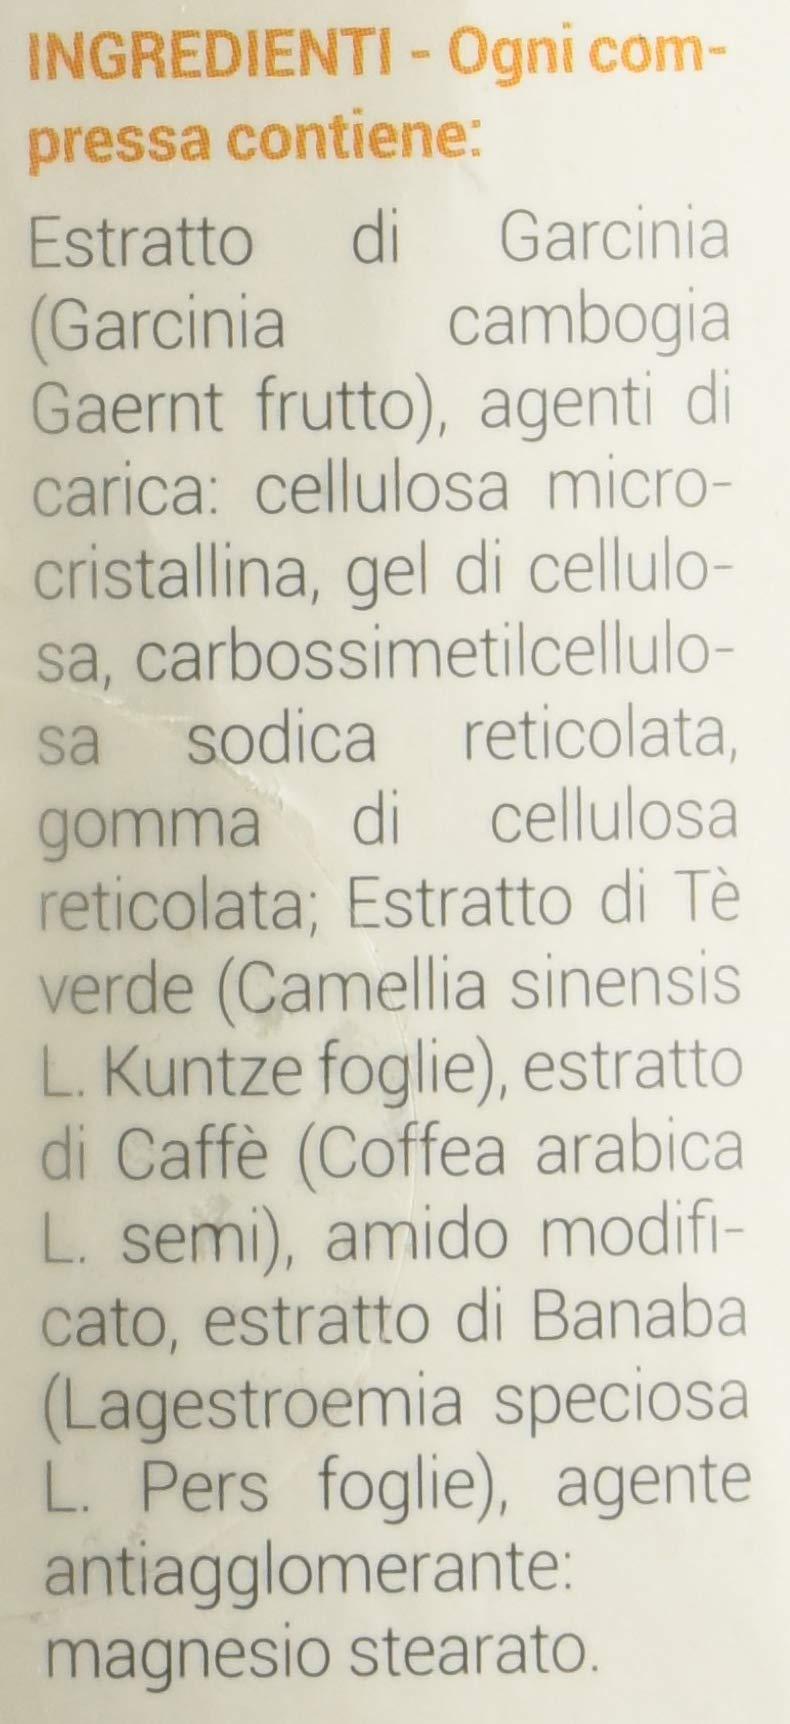 XL-S Medical Integratore Dimagrante Brucia Grassi - 60 Capsule 3 spesavip